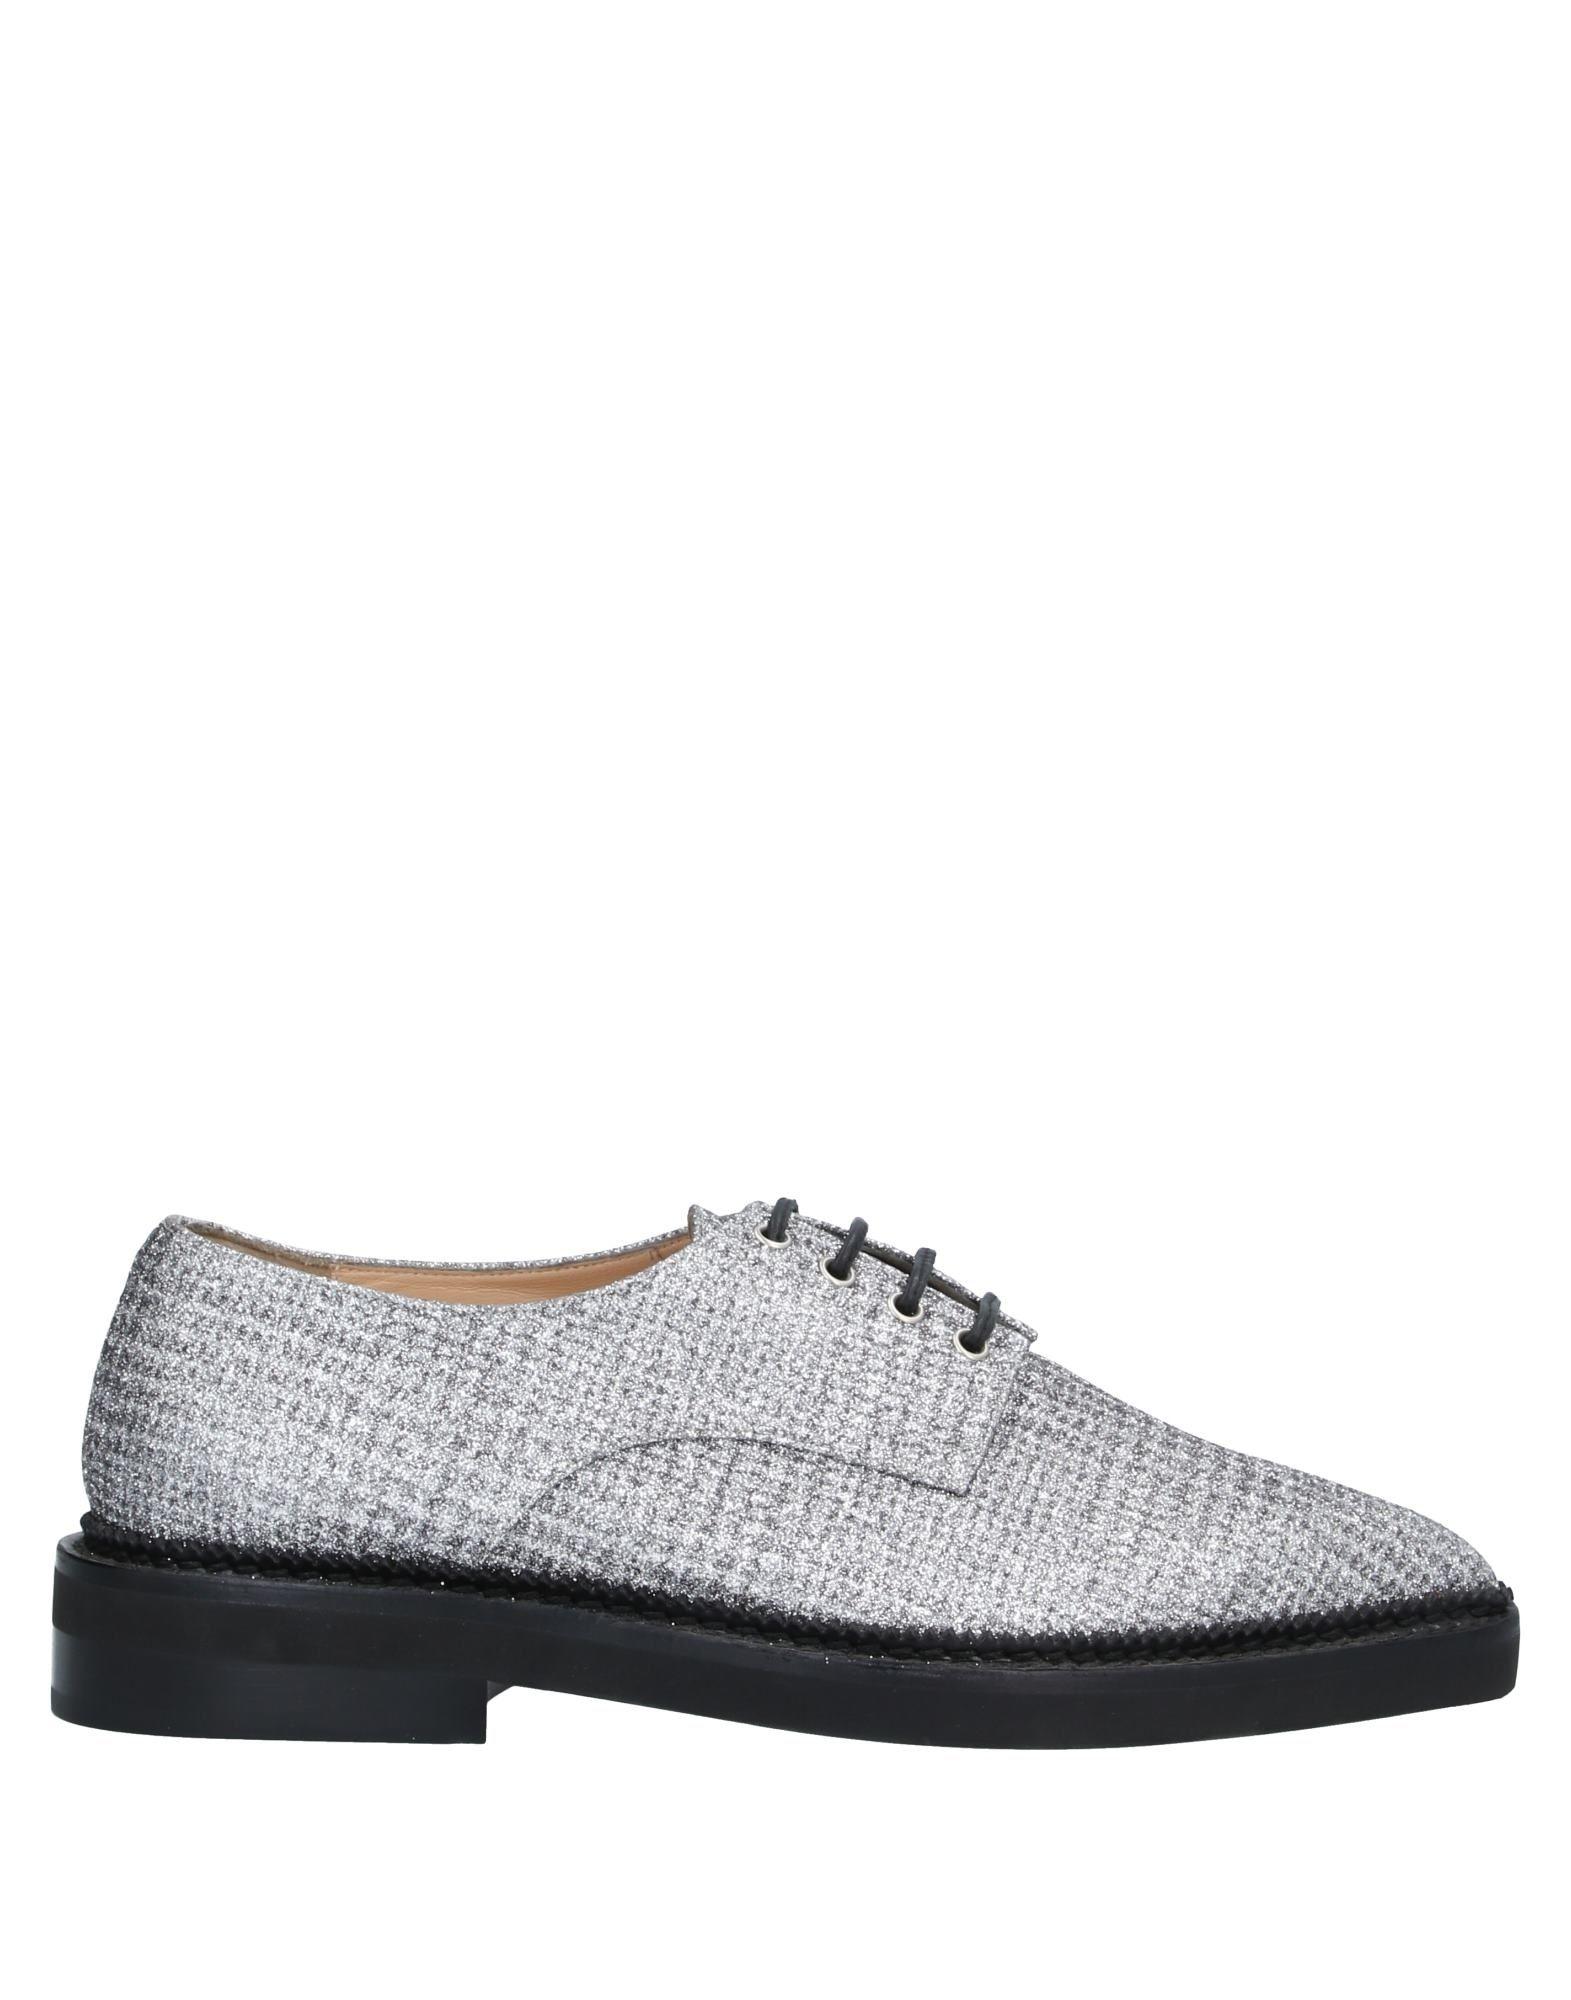 FRANCESCA BELLAVITA Обувь на шнурках francesca bertini обувь на шнурках